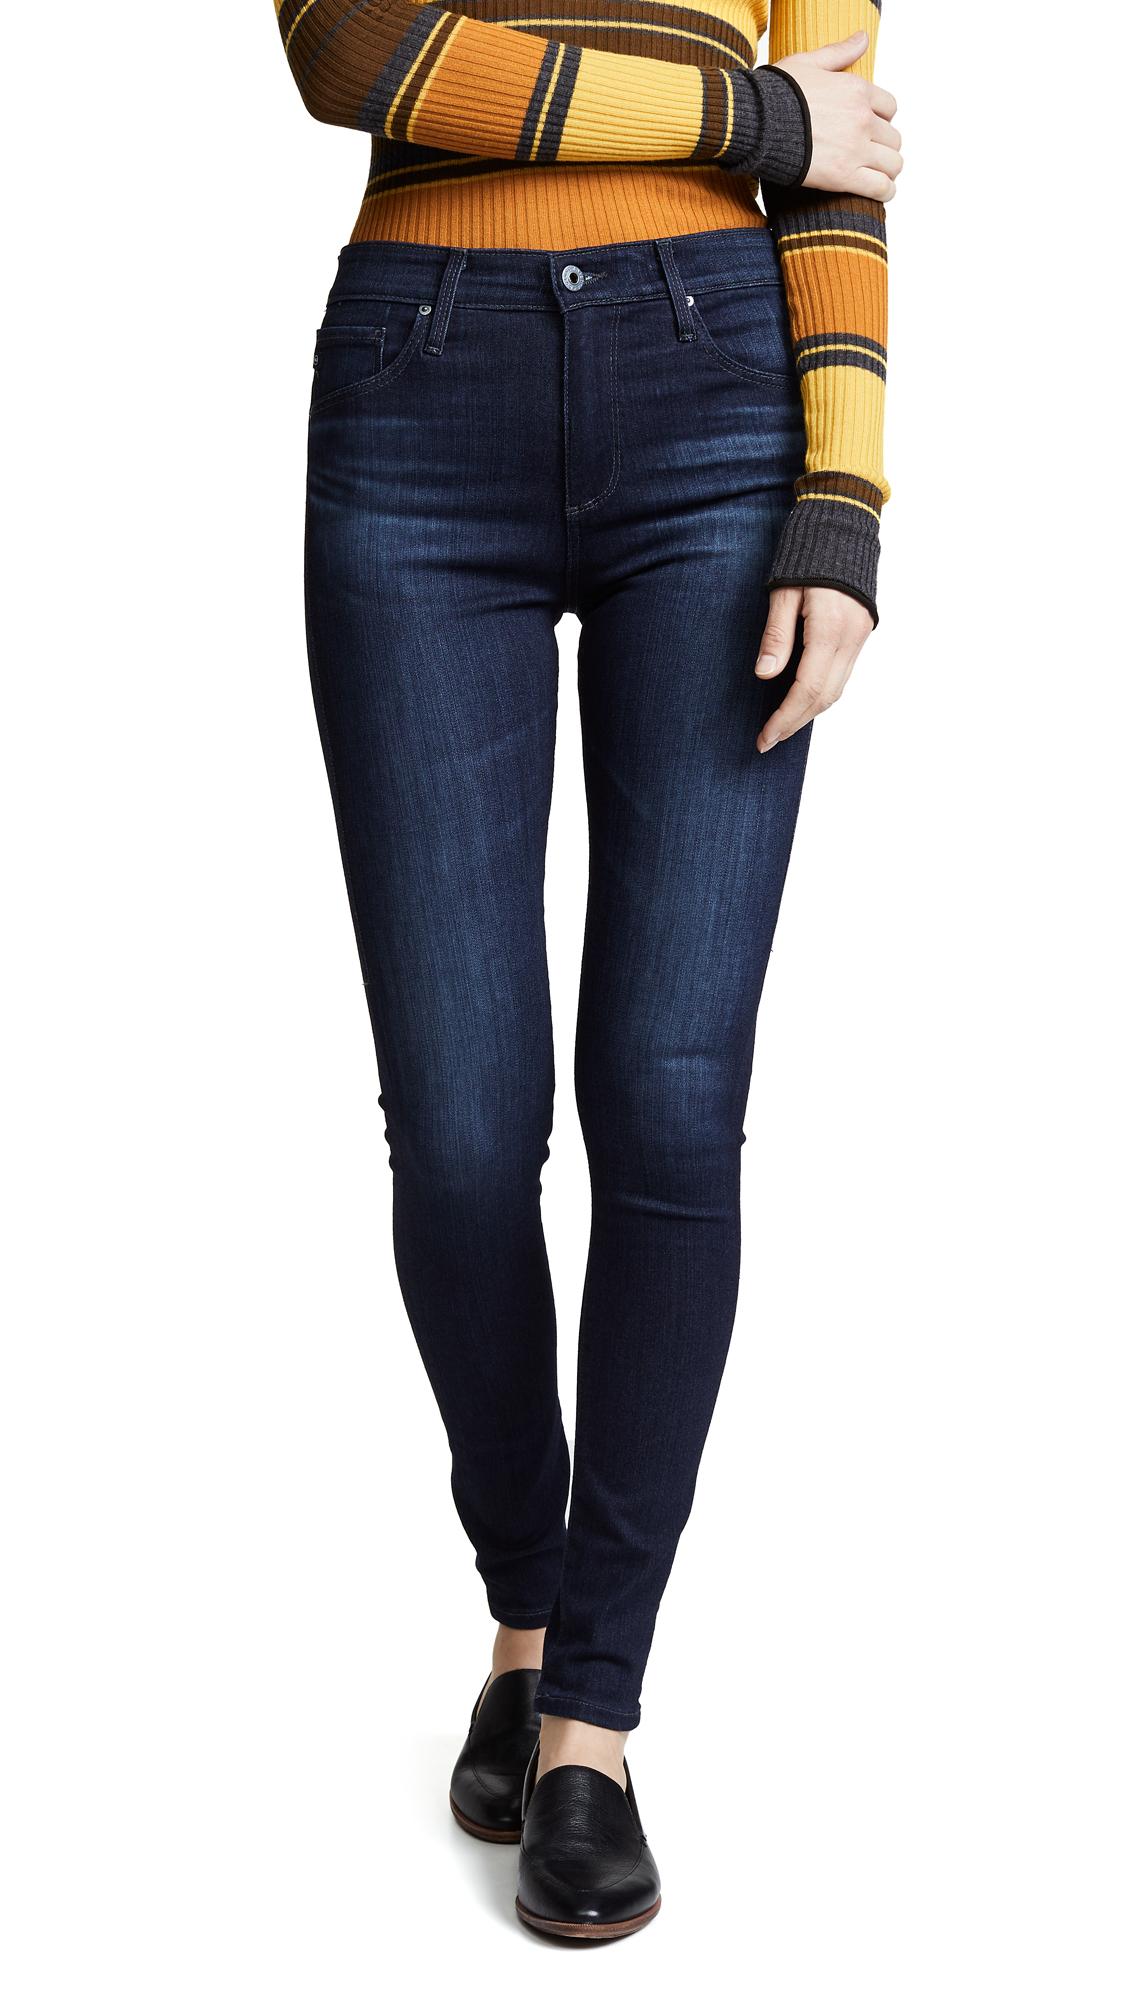 AG The Farrah High Rise Skinny Jeans - Brooks